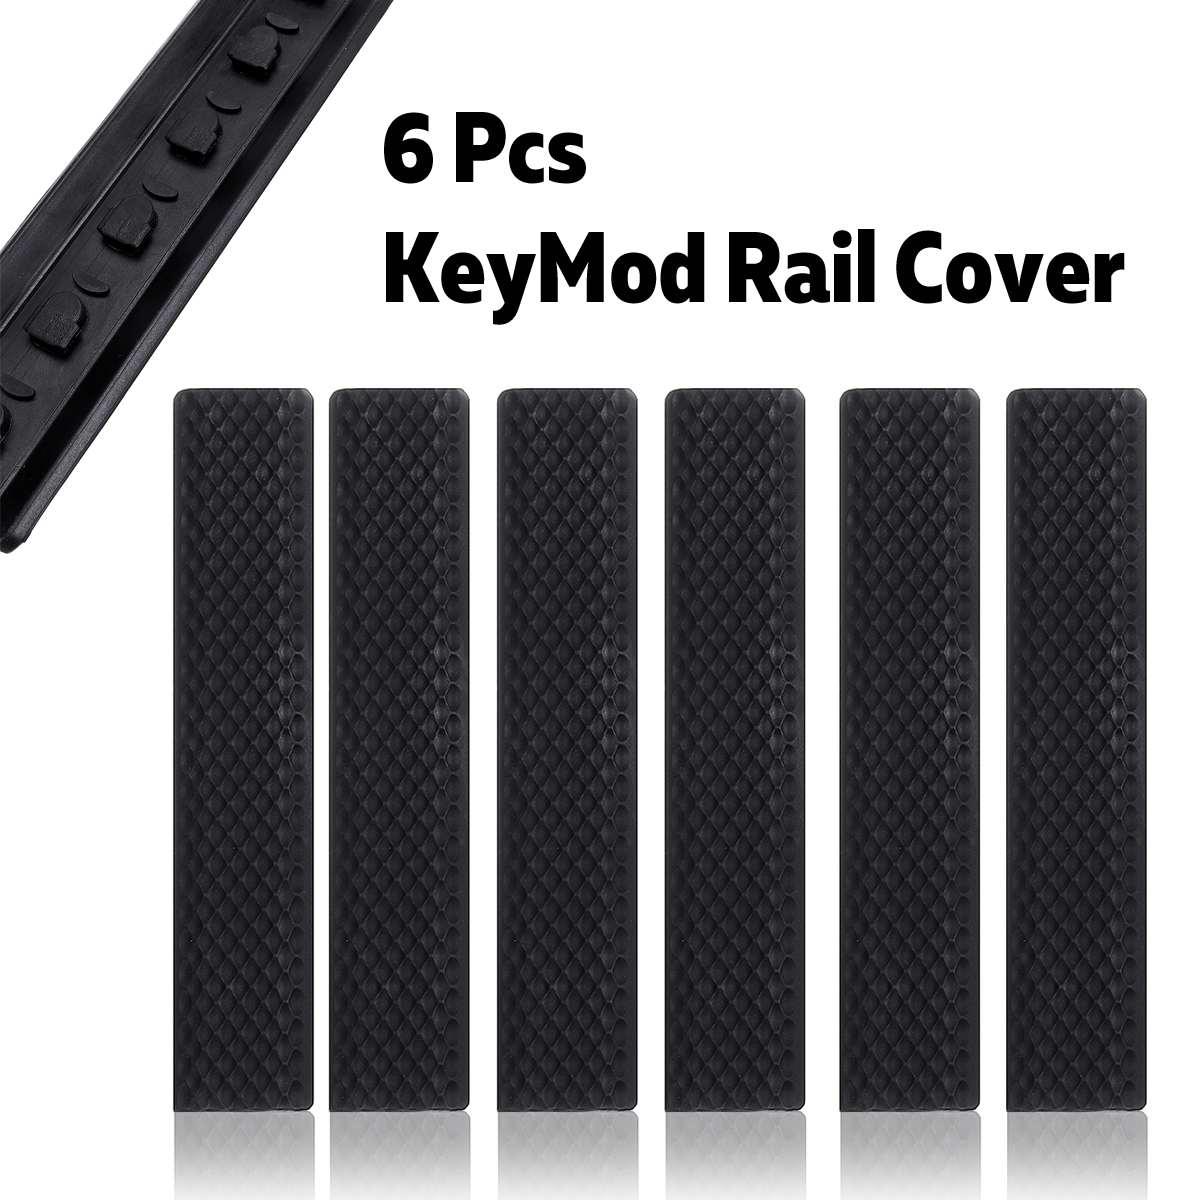 Pack Of 6 Black For KeyMod Rail Cover Textured Anti Slip Panels Black Rubber